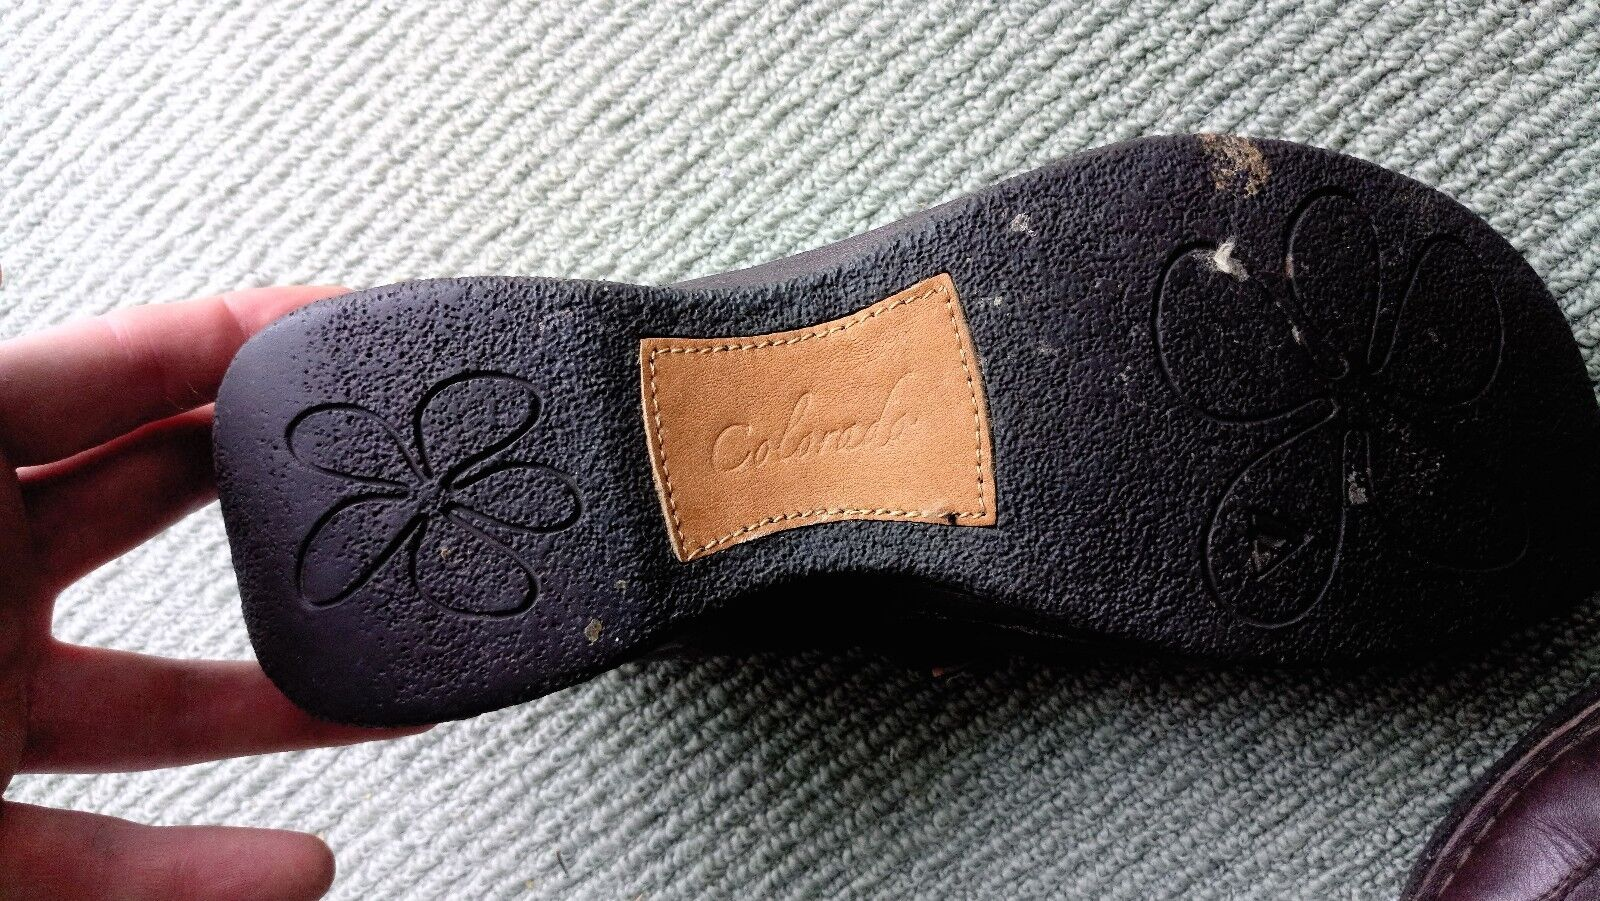 Vintage Colarado Women's Lady shamrock Jane Shoes Clogs Brown Leather shamrock Lady Sz9.5 313b94